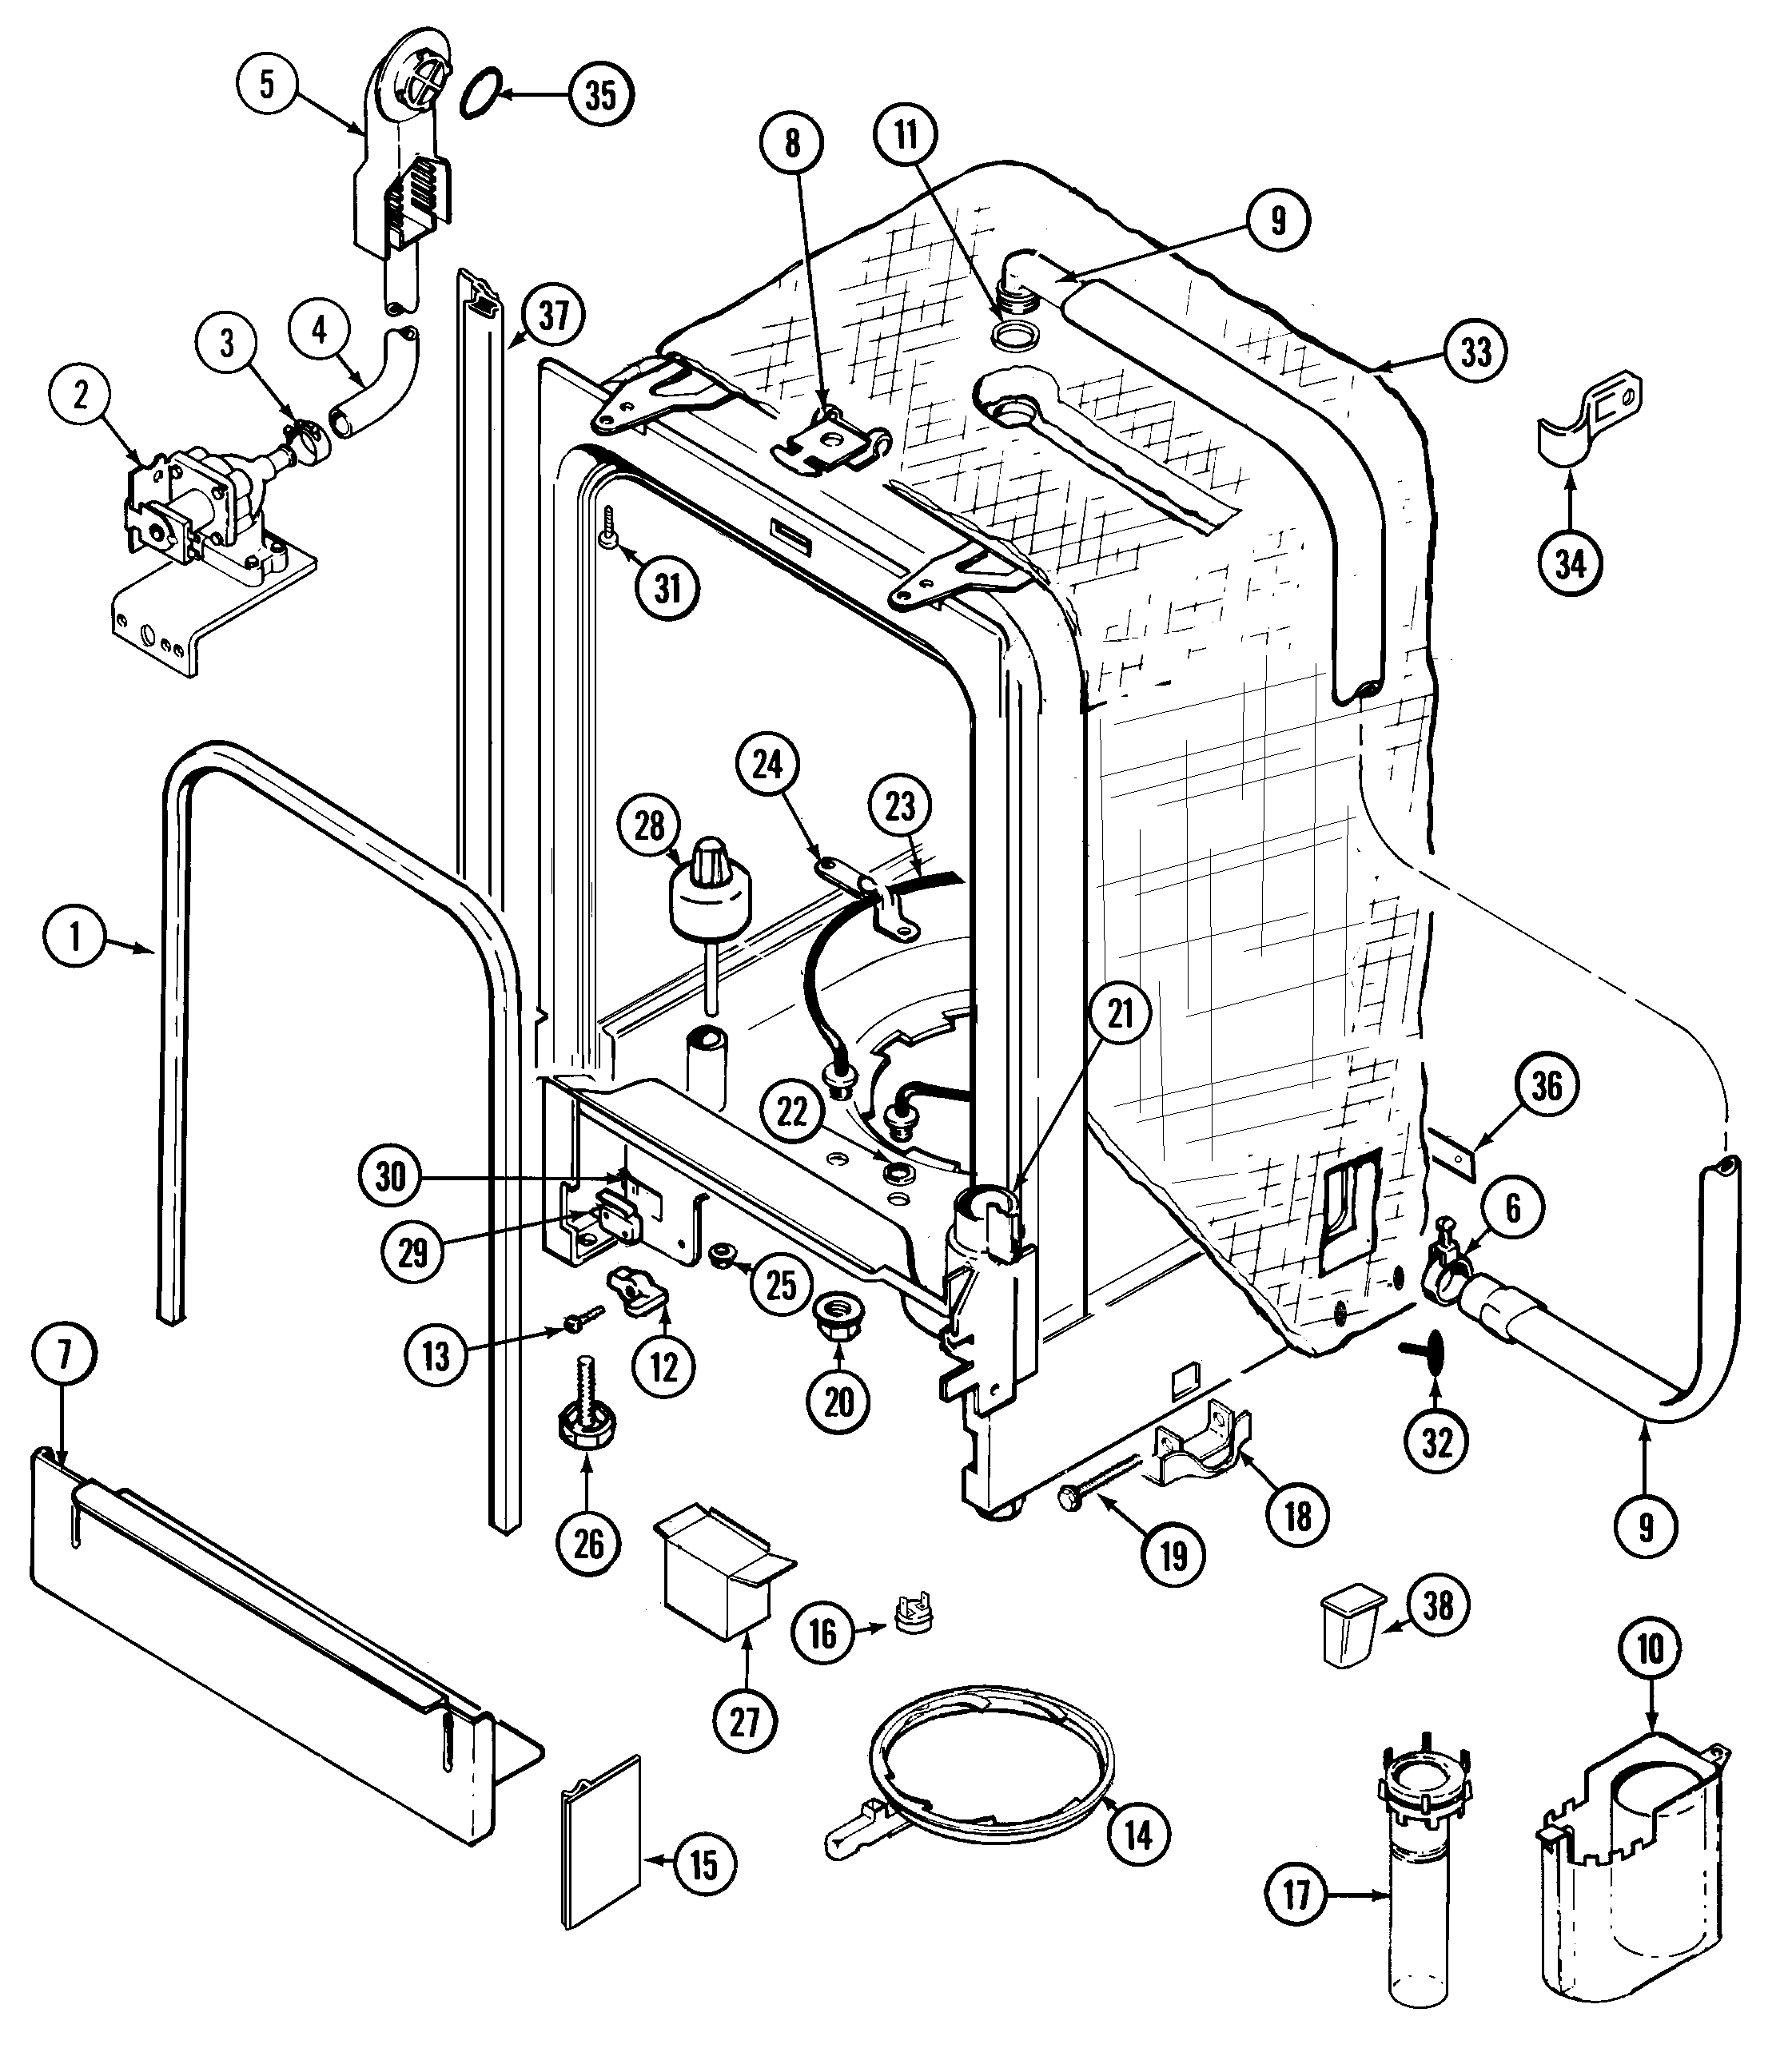 maytag diagrams hm 2043  maytag dishwasher parts diagram  hm 2043  maytag dishwasher parts diagram